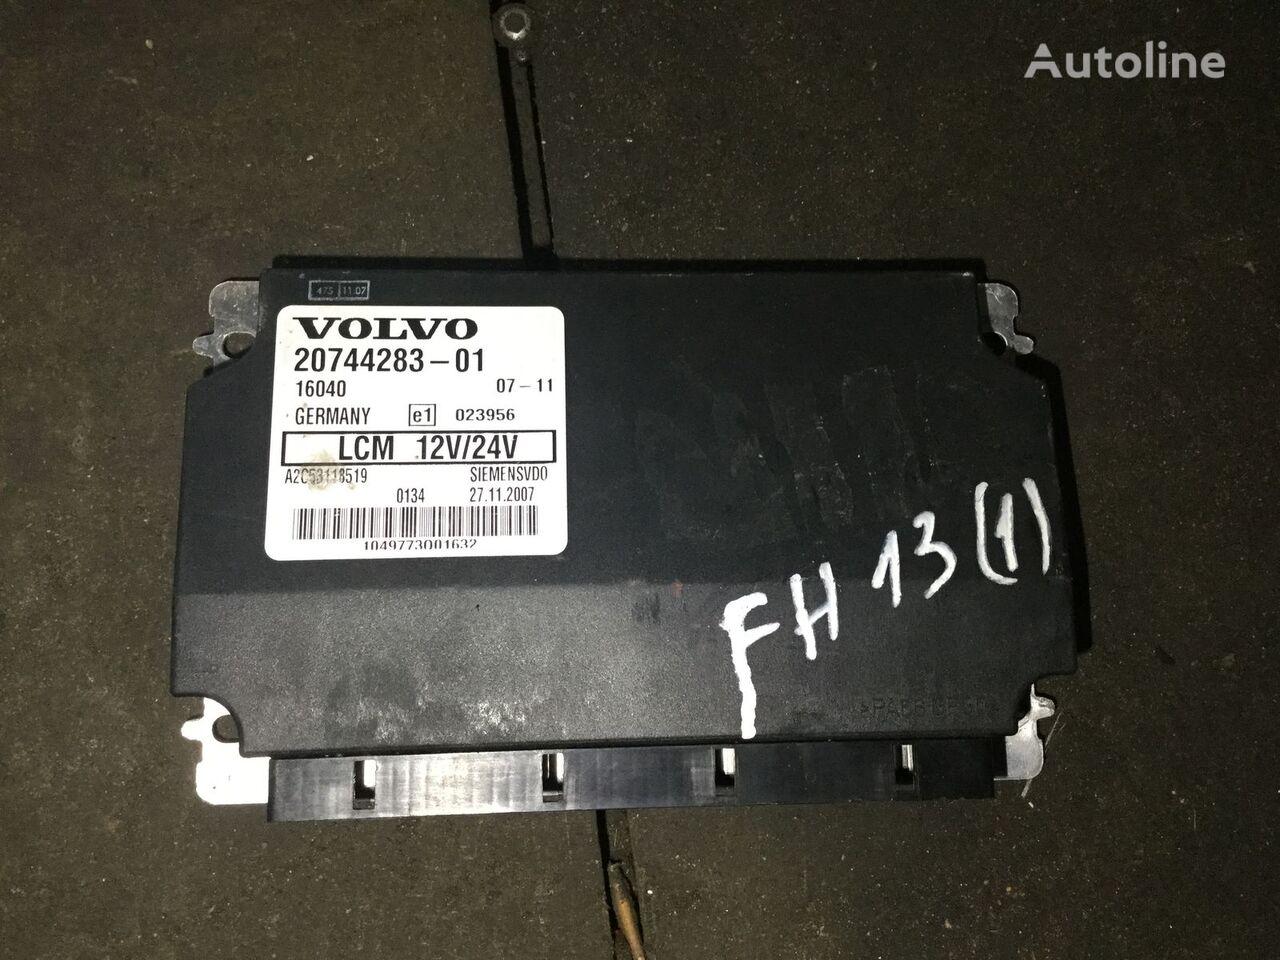 VOLVO FH13 20744283-01 control unit for tractor unit